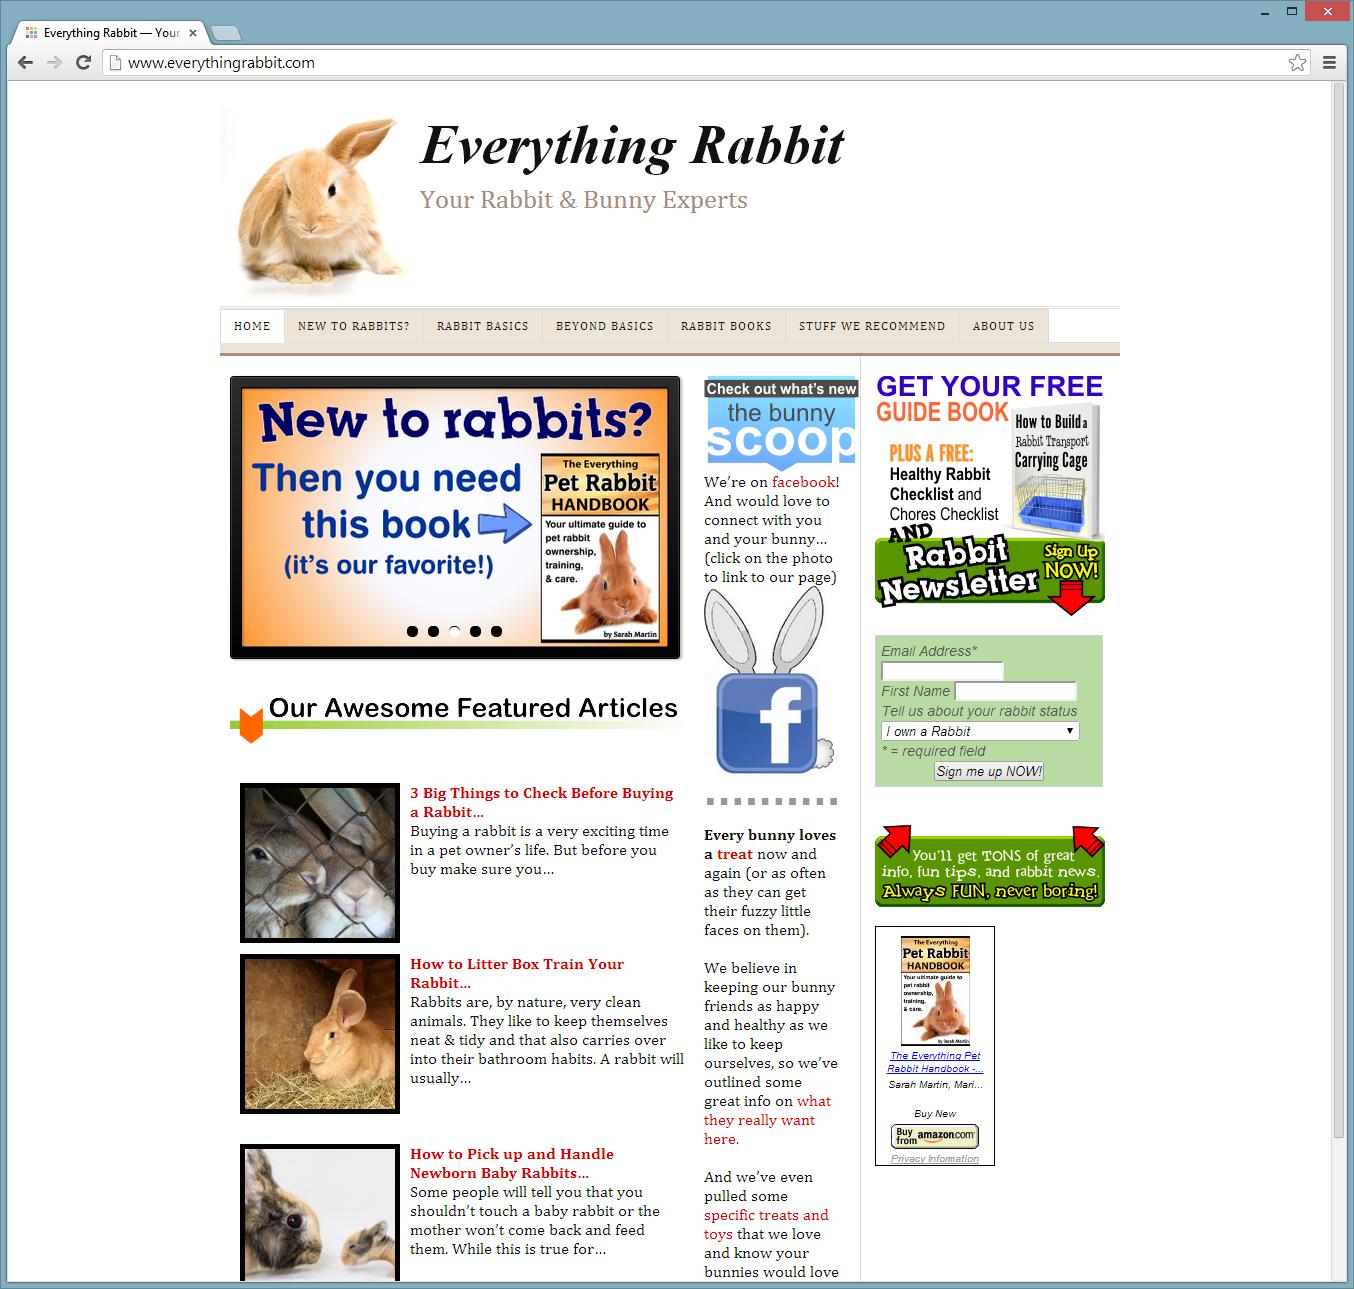 EverythingRabbit